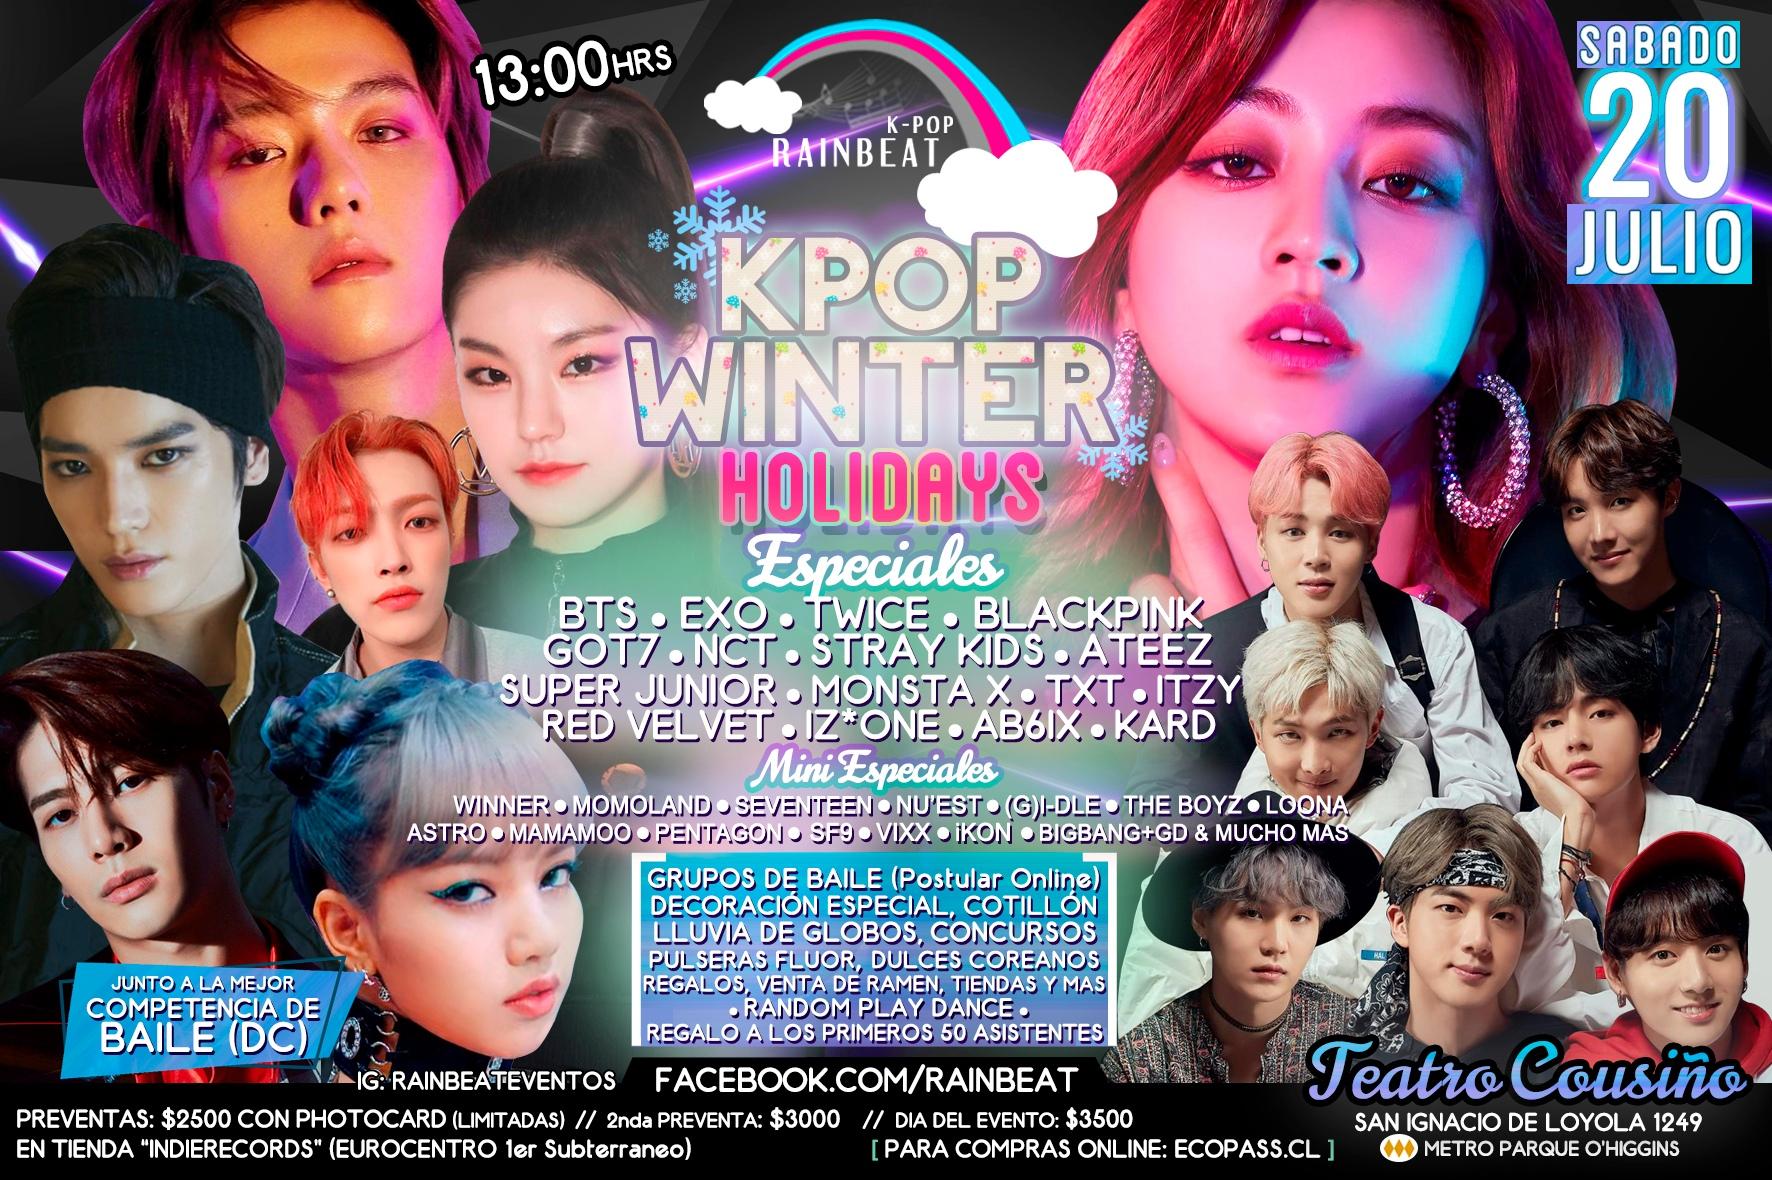 Razorblade kpop invierno  1